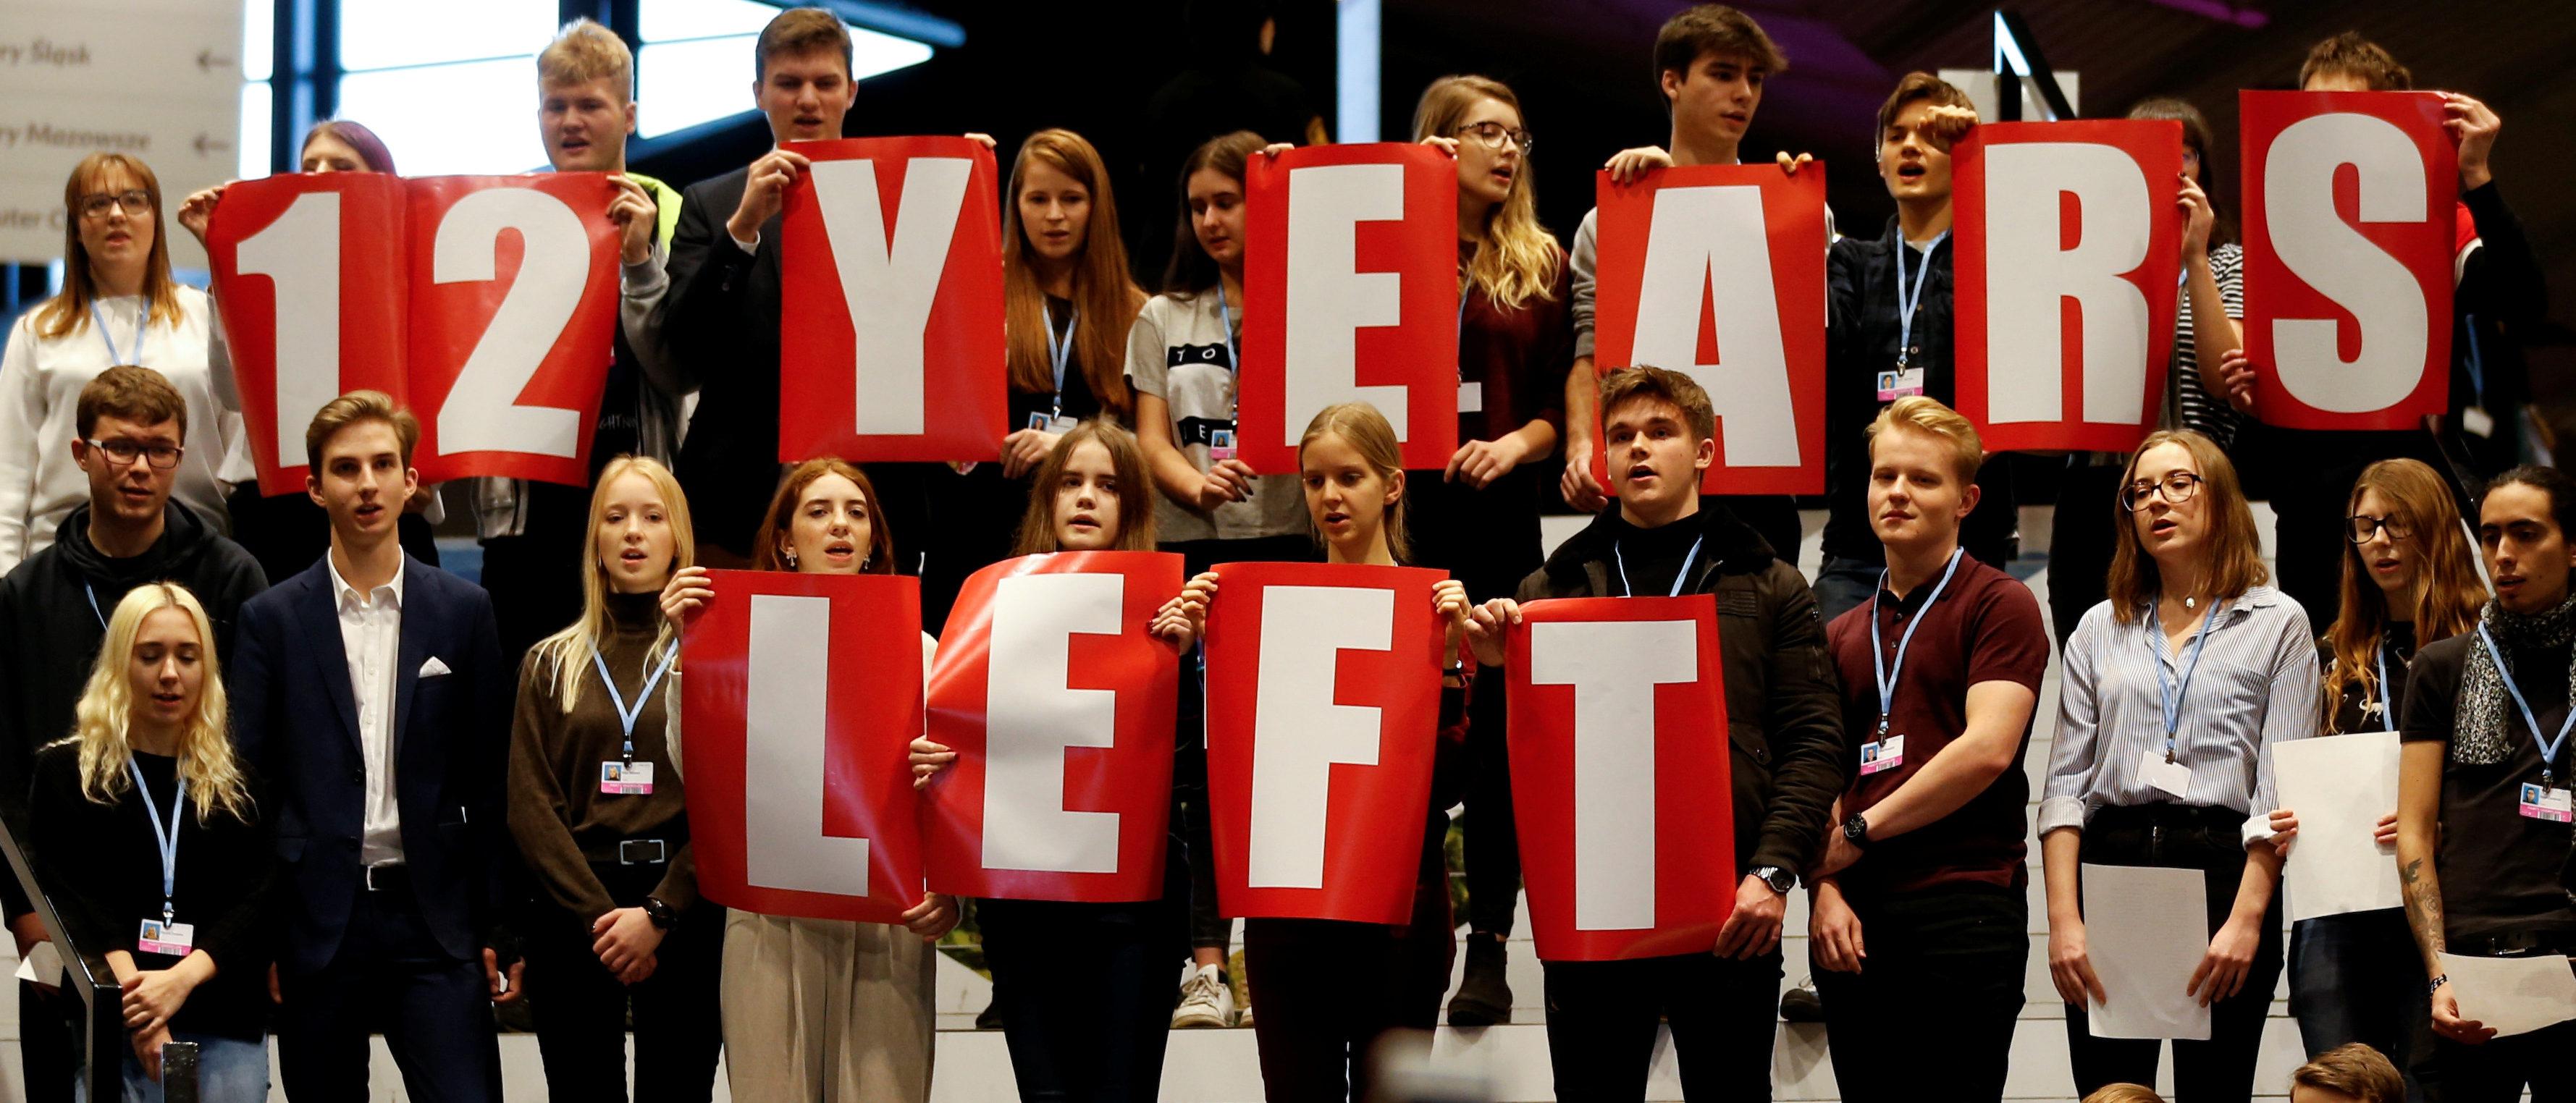 Local school children join Greta Thunberg's initiative on climate strike during the COP24 UN Climate Change Conference 2018 in Katowice, Poland December 14, 2018. Agencja Gazeta/Grzegorz Celejewski via REUTERS.